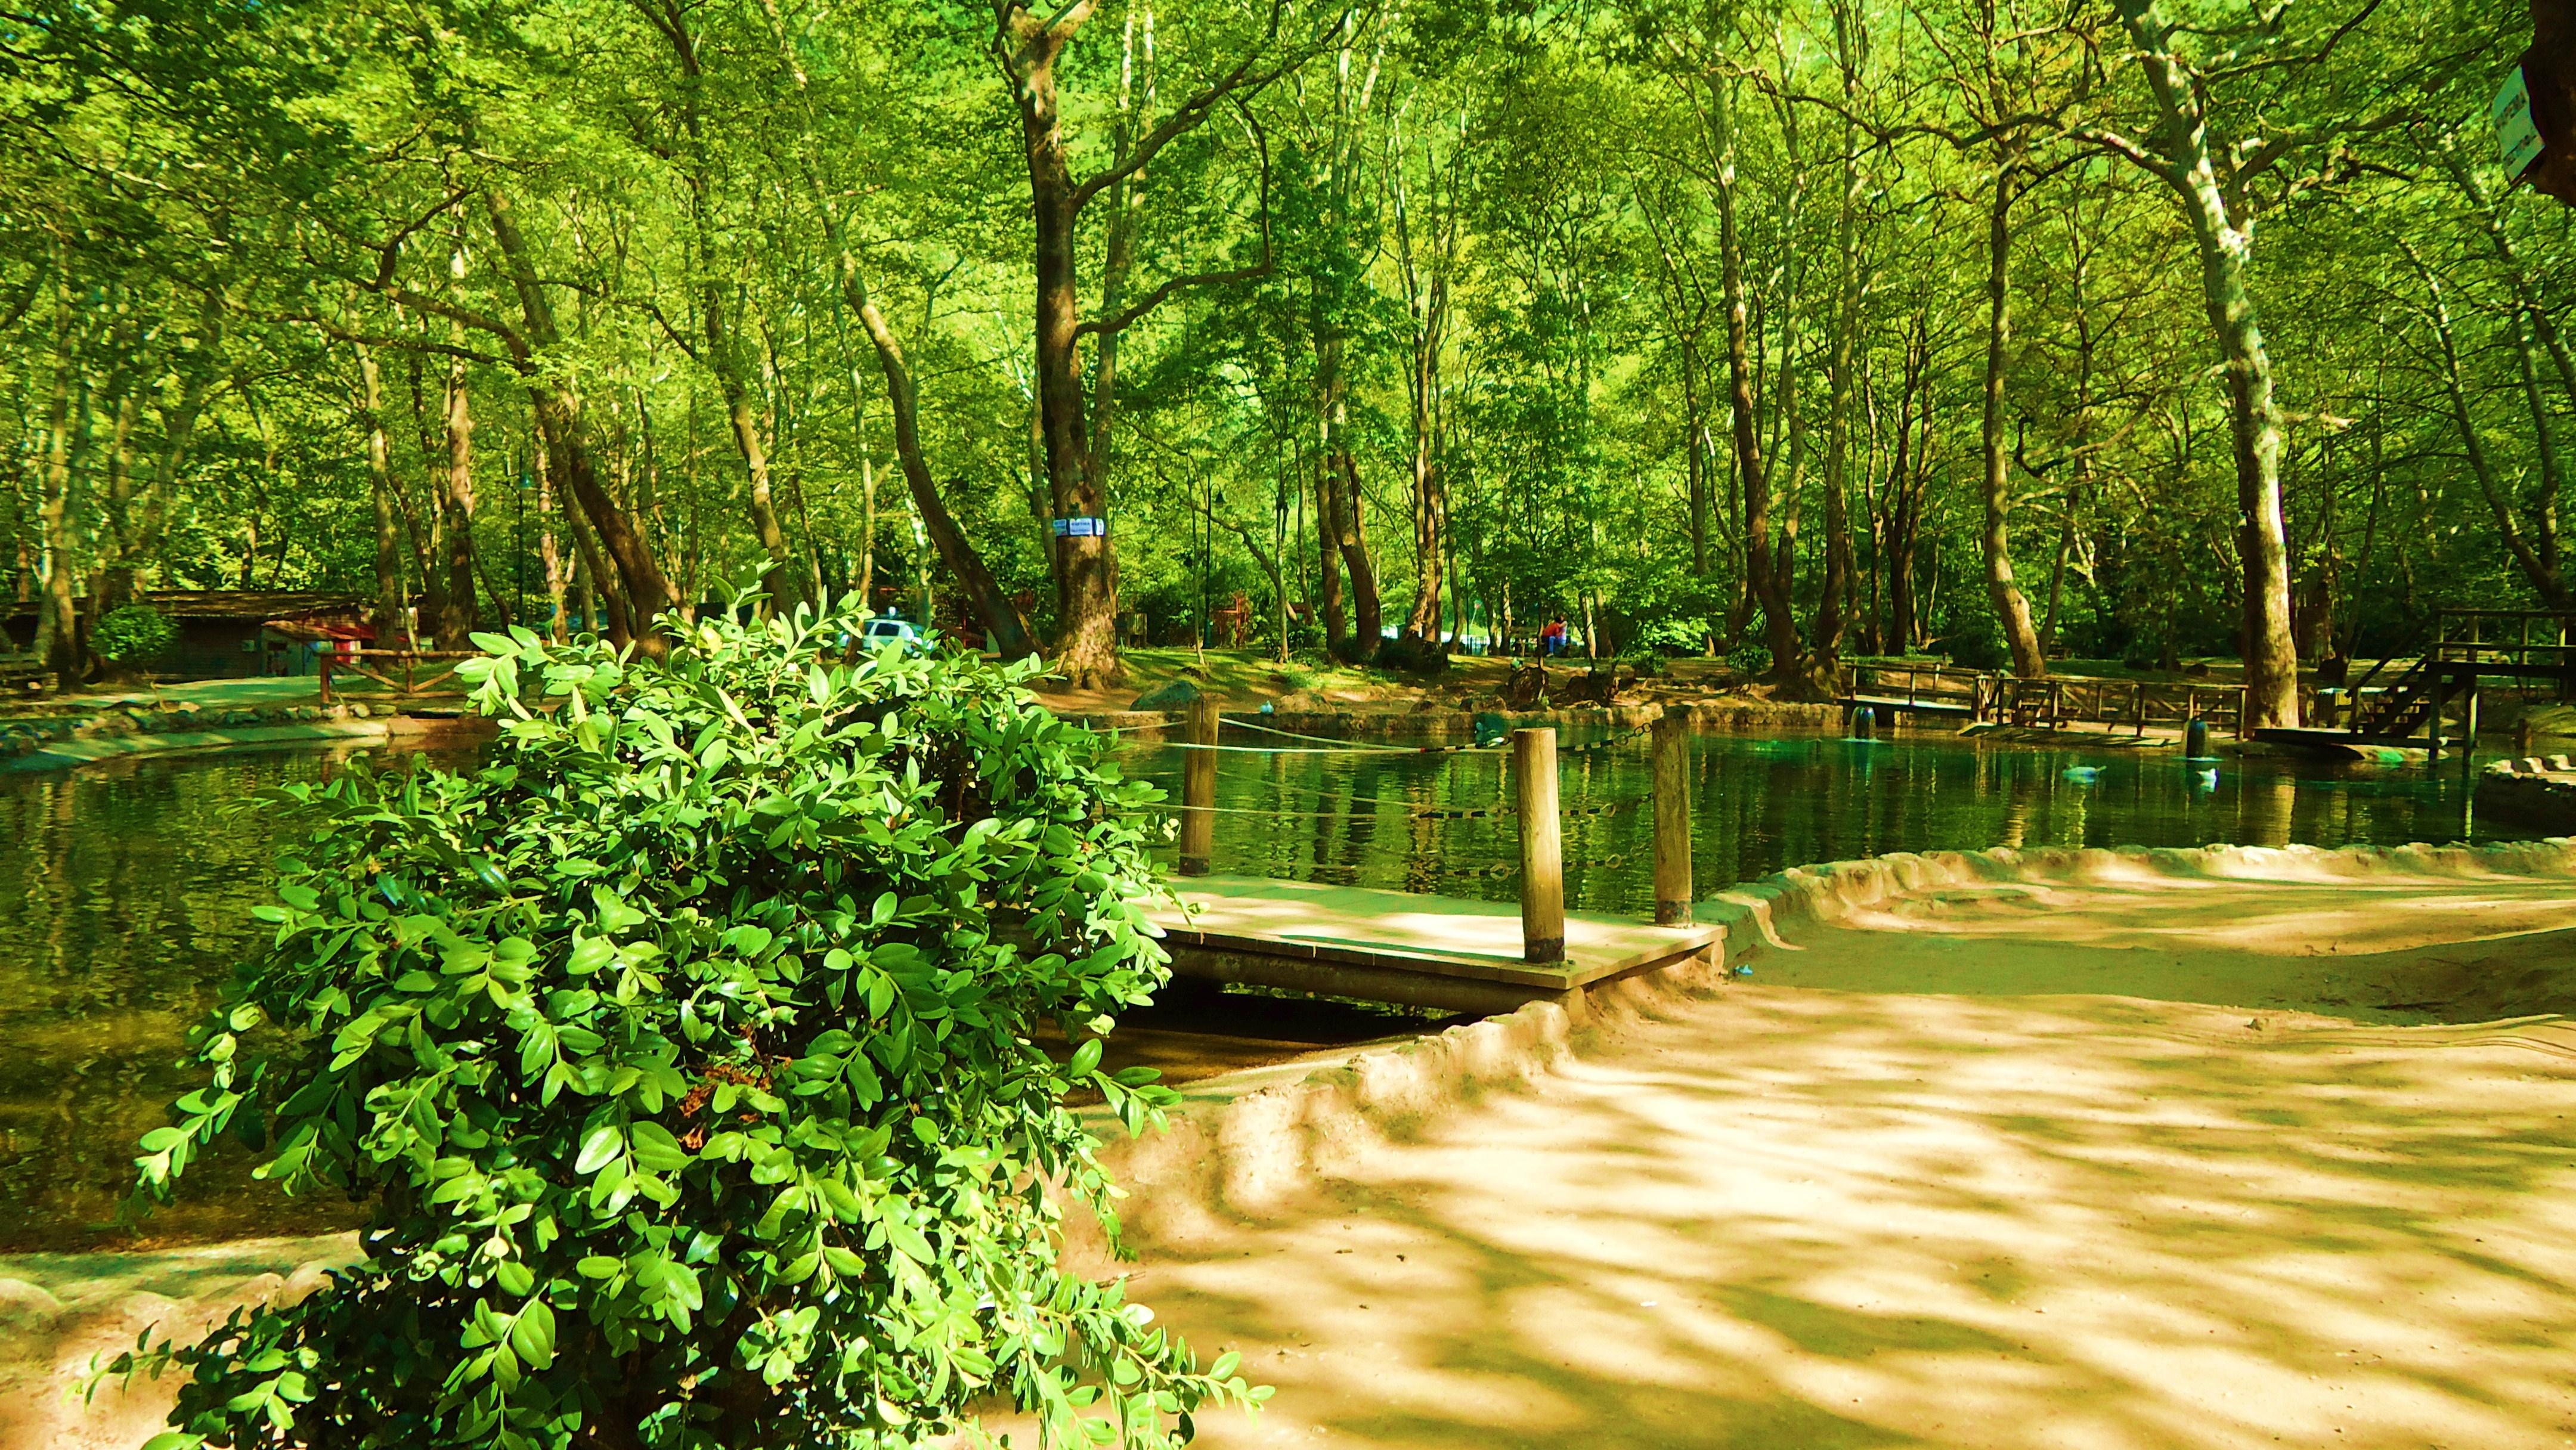 File:Agios Nikolaos Park, Naousa.jpg - Wikimedia Commons